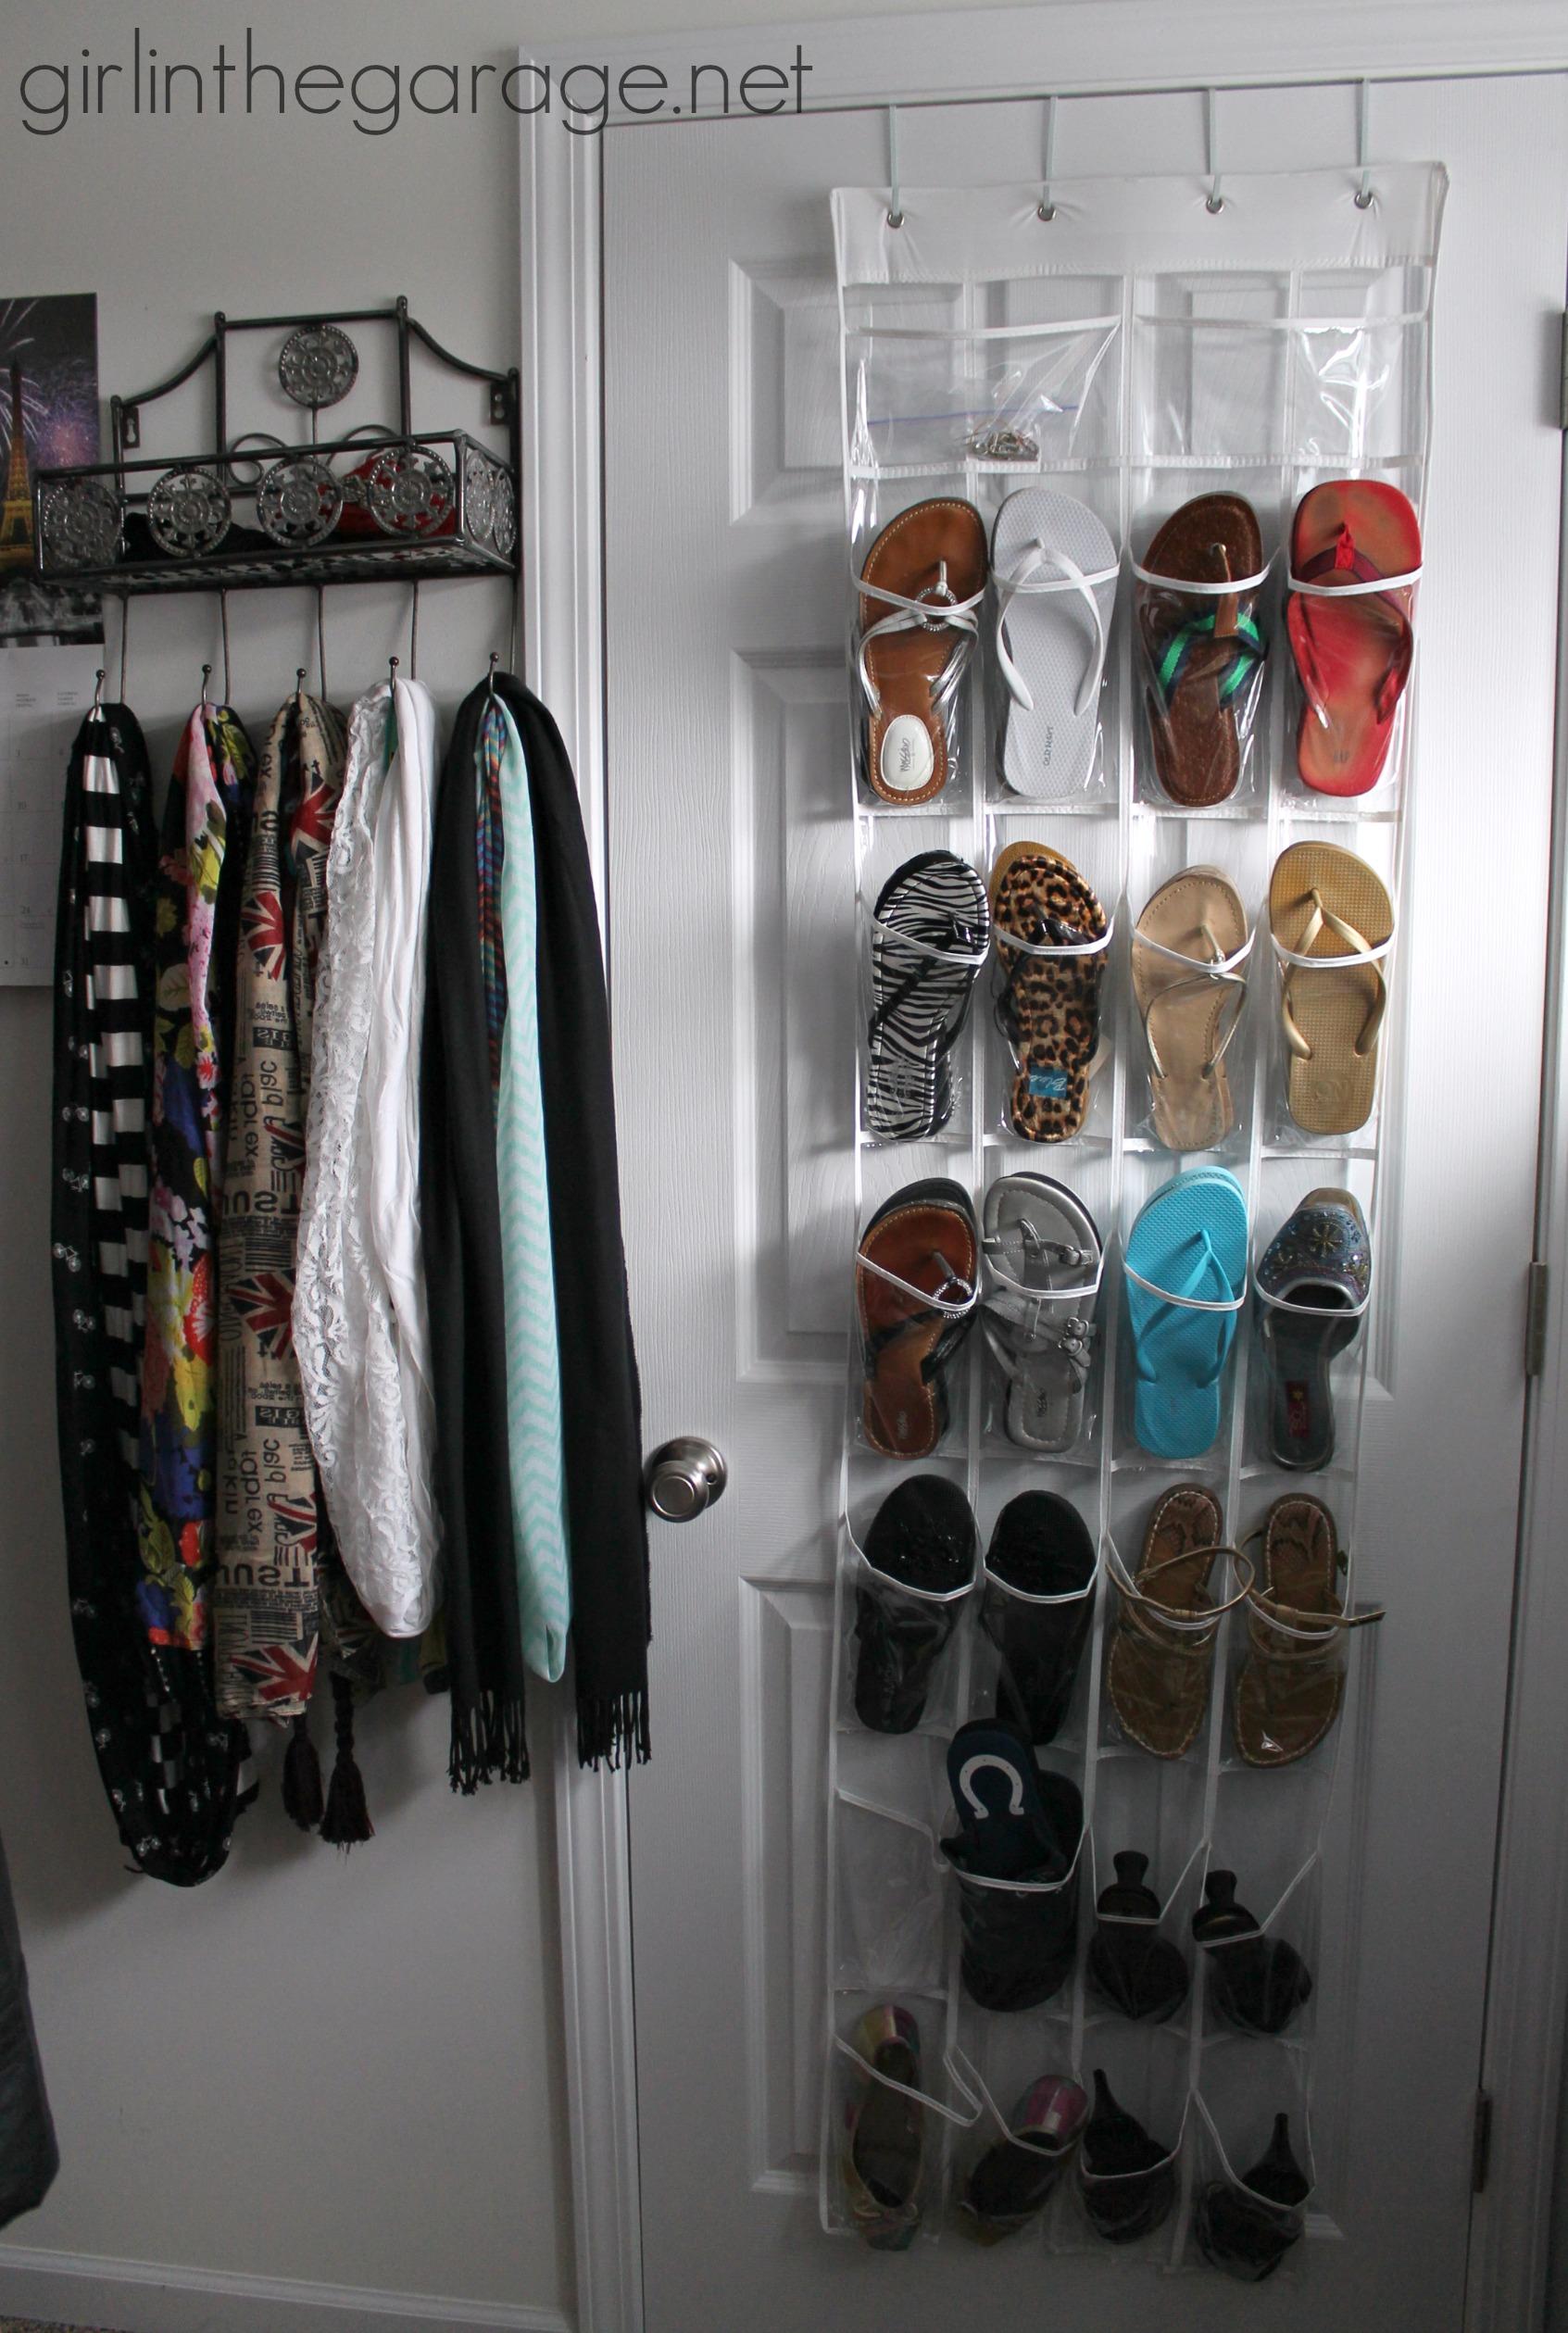 Find Hidden Storage In Your Home Girl In The Garage 174